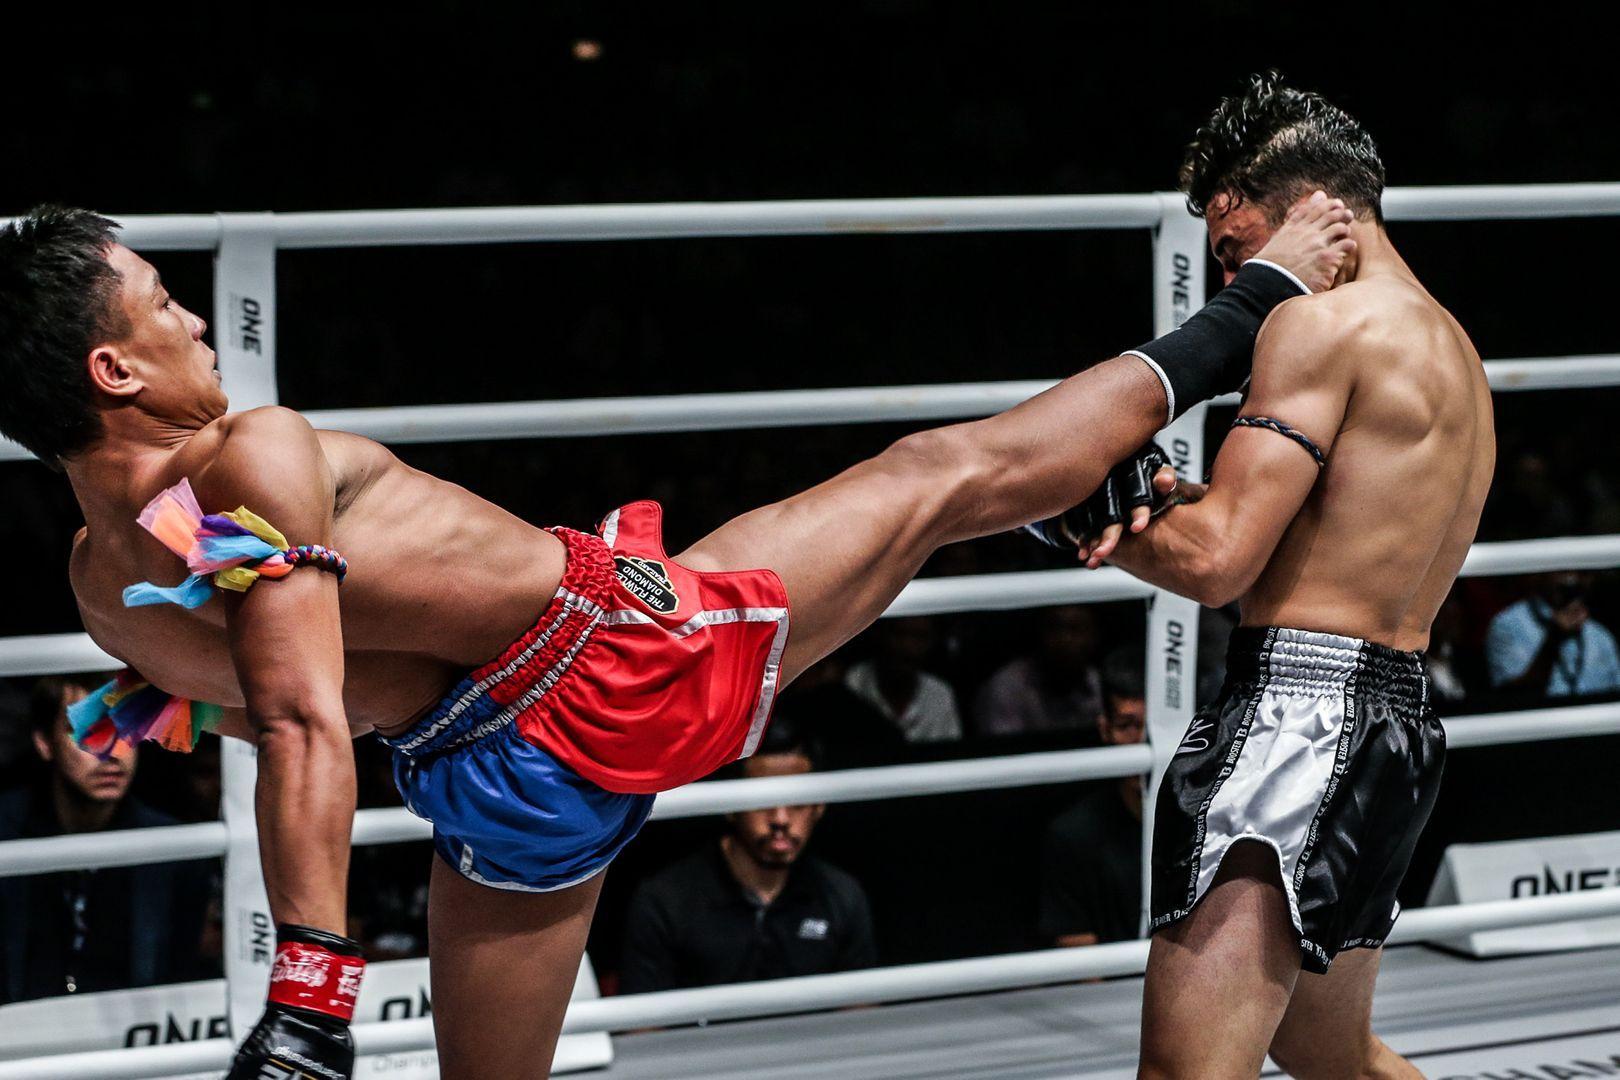 Mongkolpetch Petchyindee Academy cracks Joseph Lasiri with a push kick